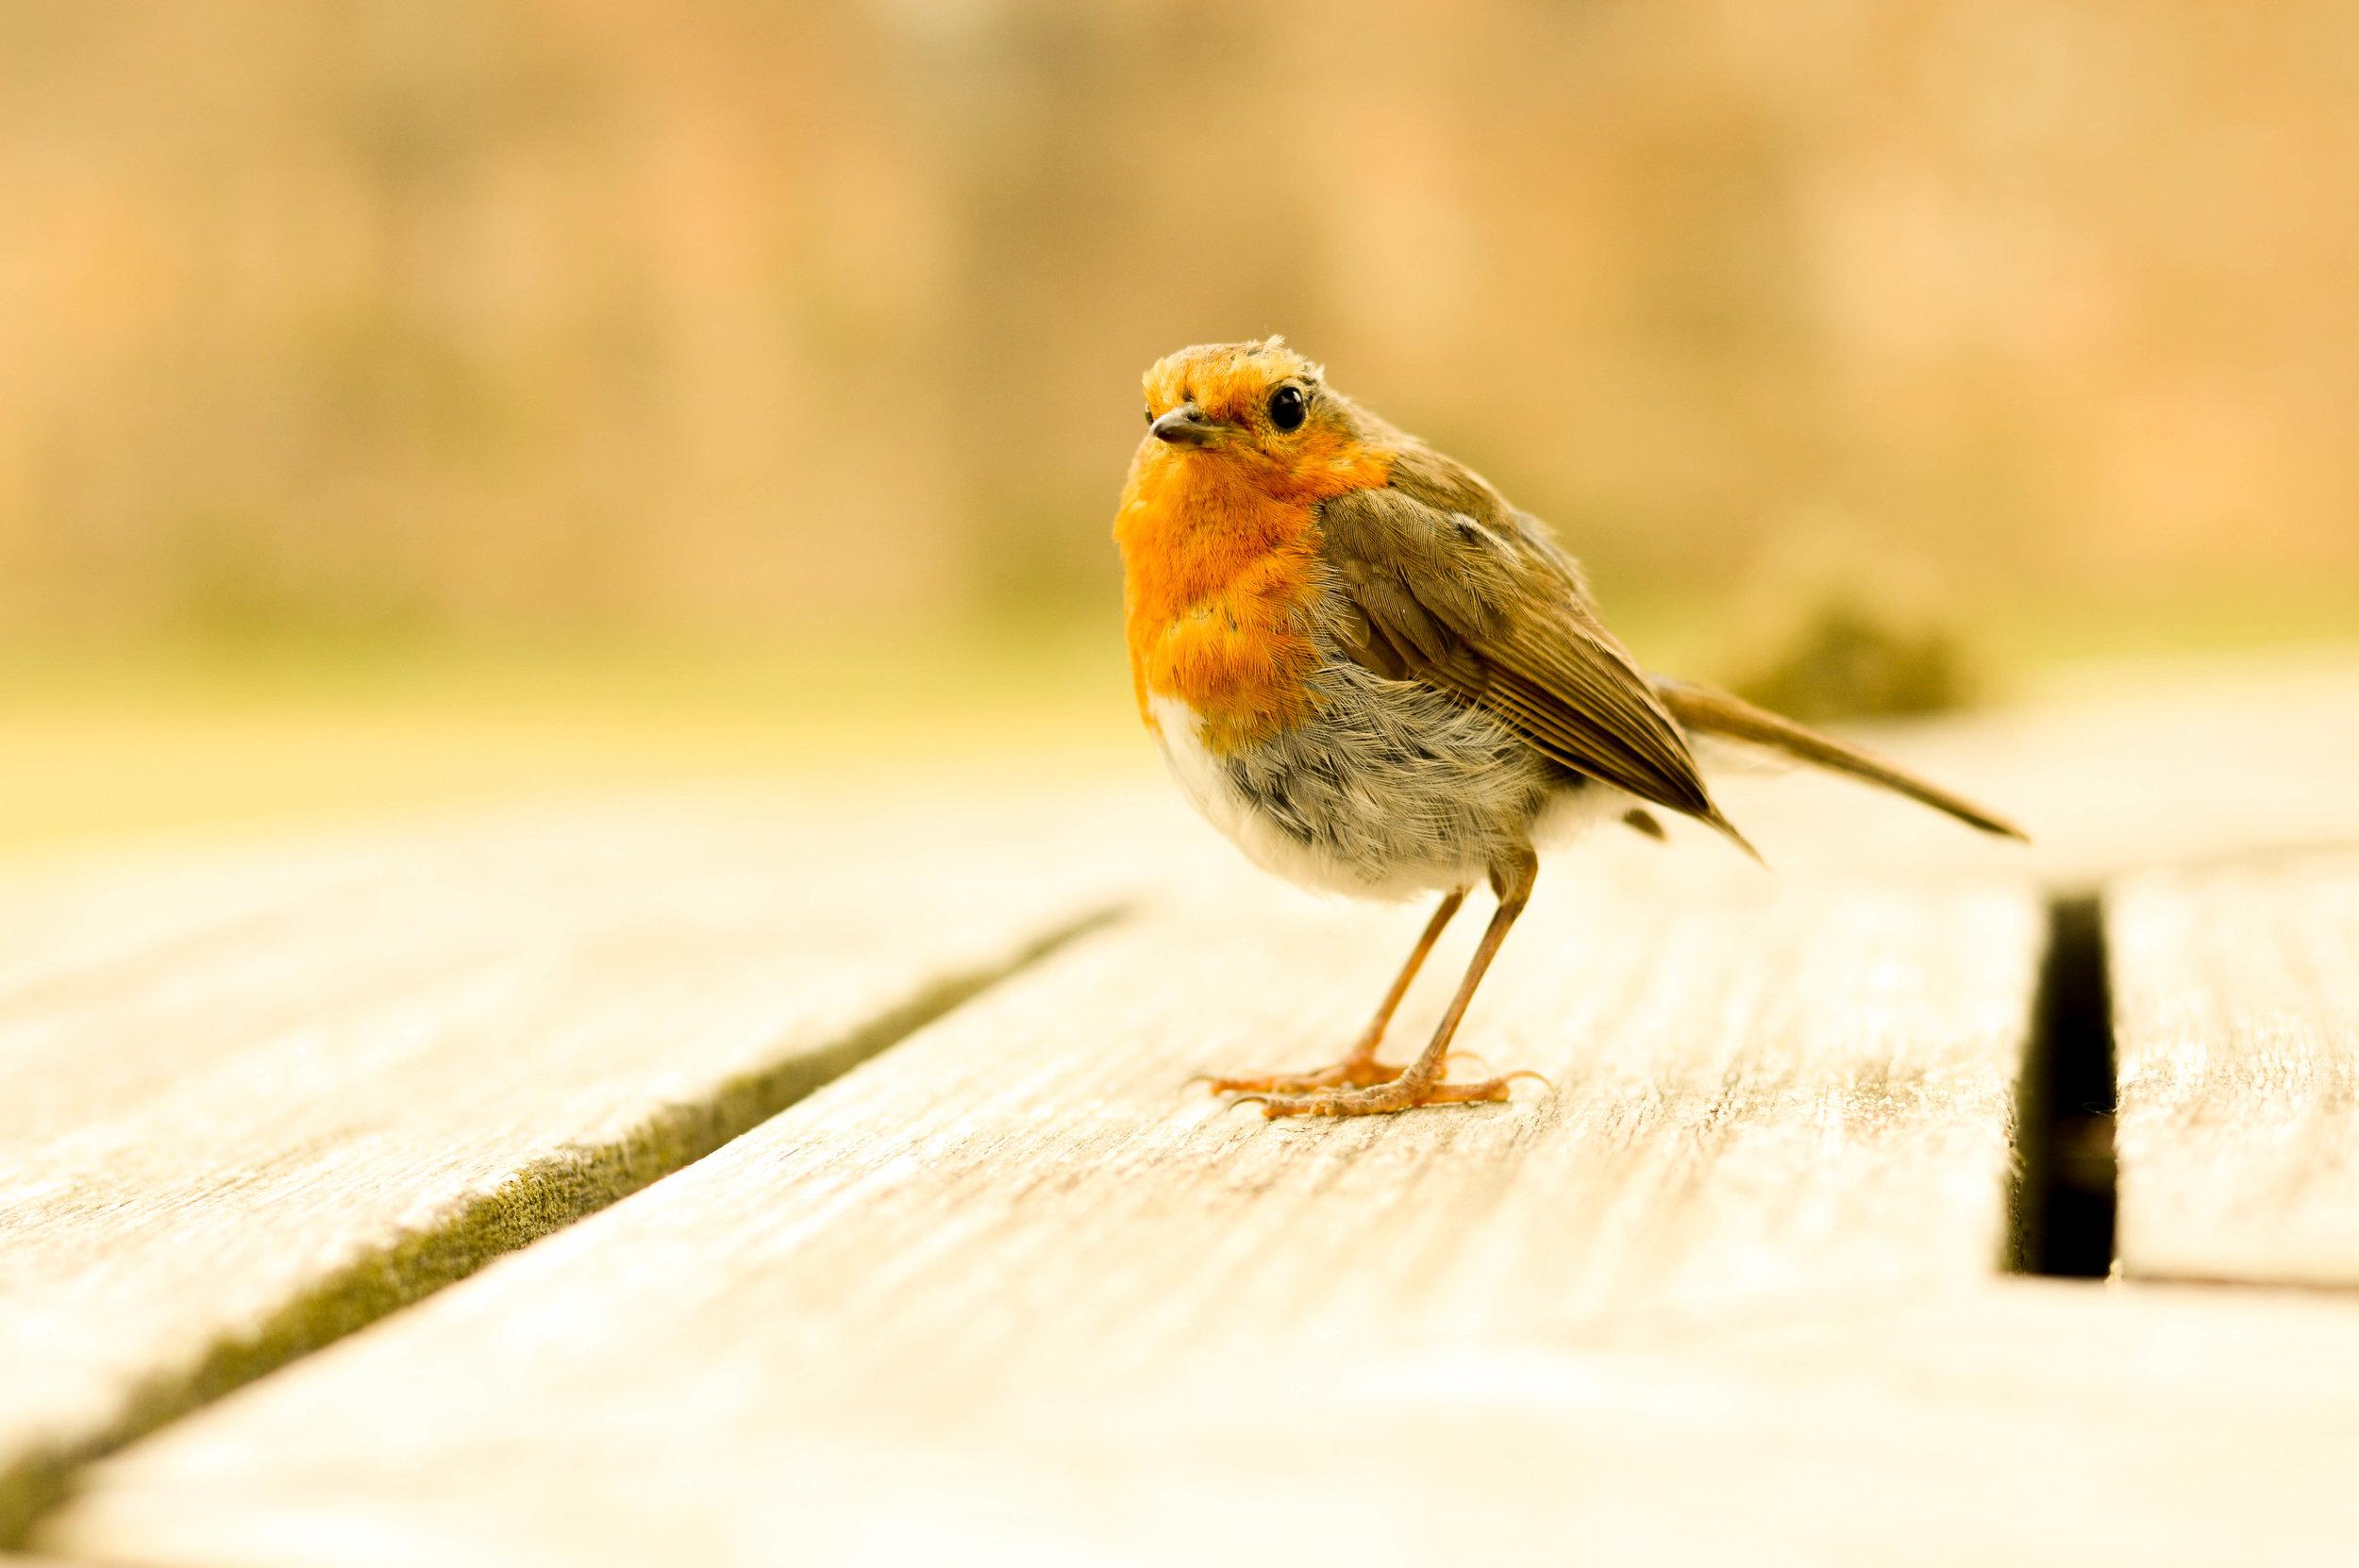 The friendliest Robin.